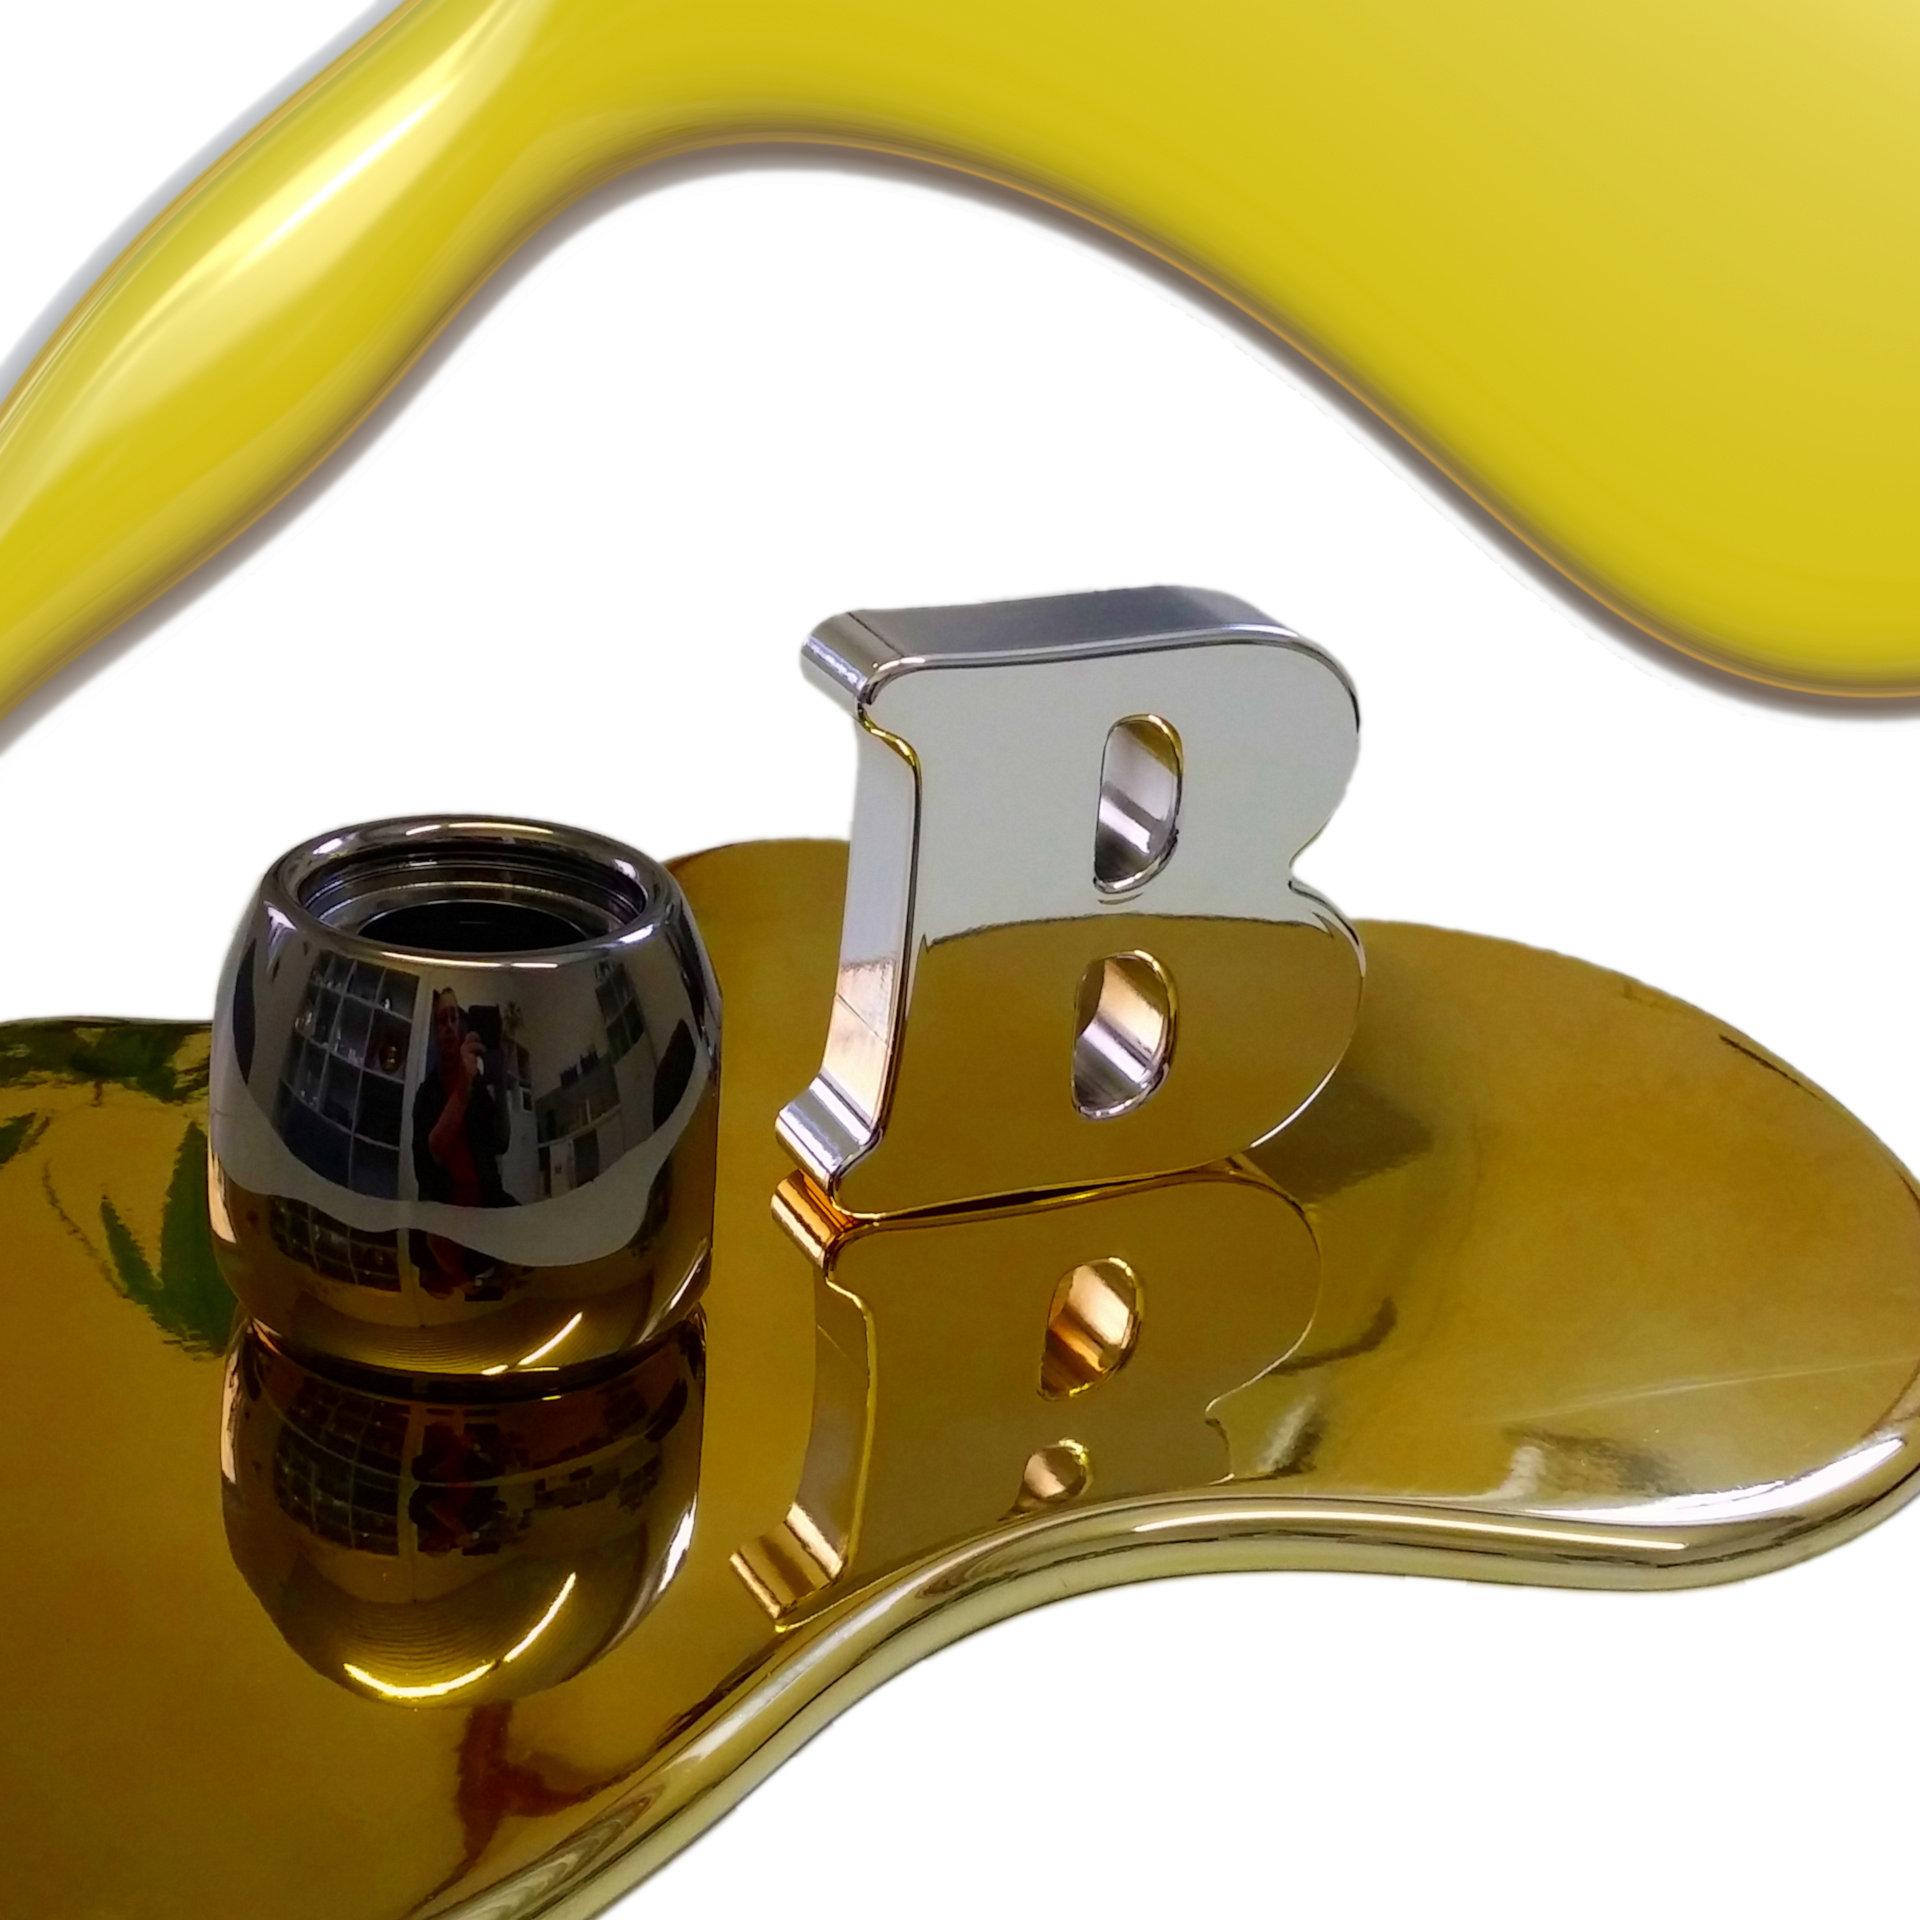 Werbeartikel Chrom-/Schwarzchrom-/Goldoptik